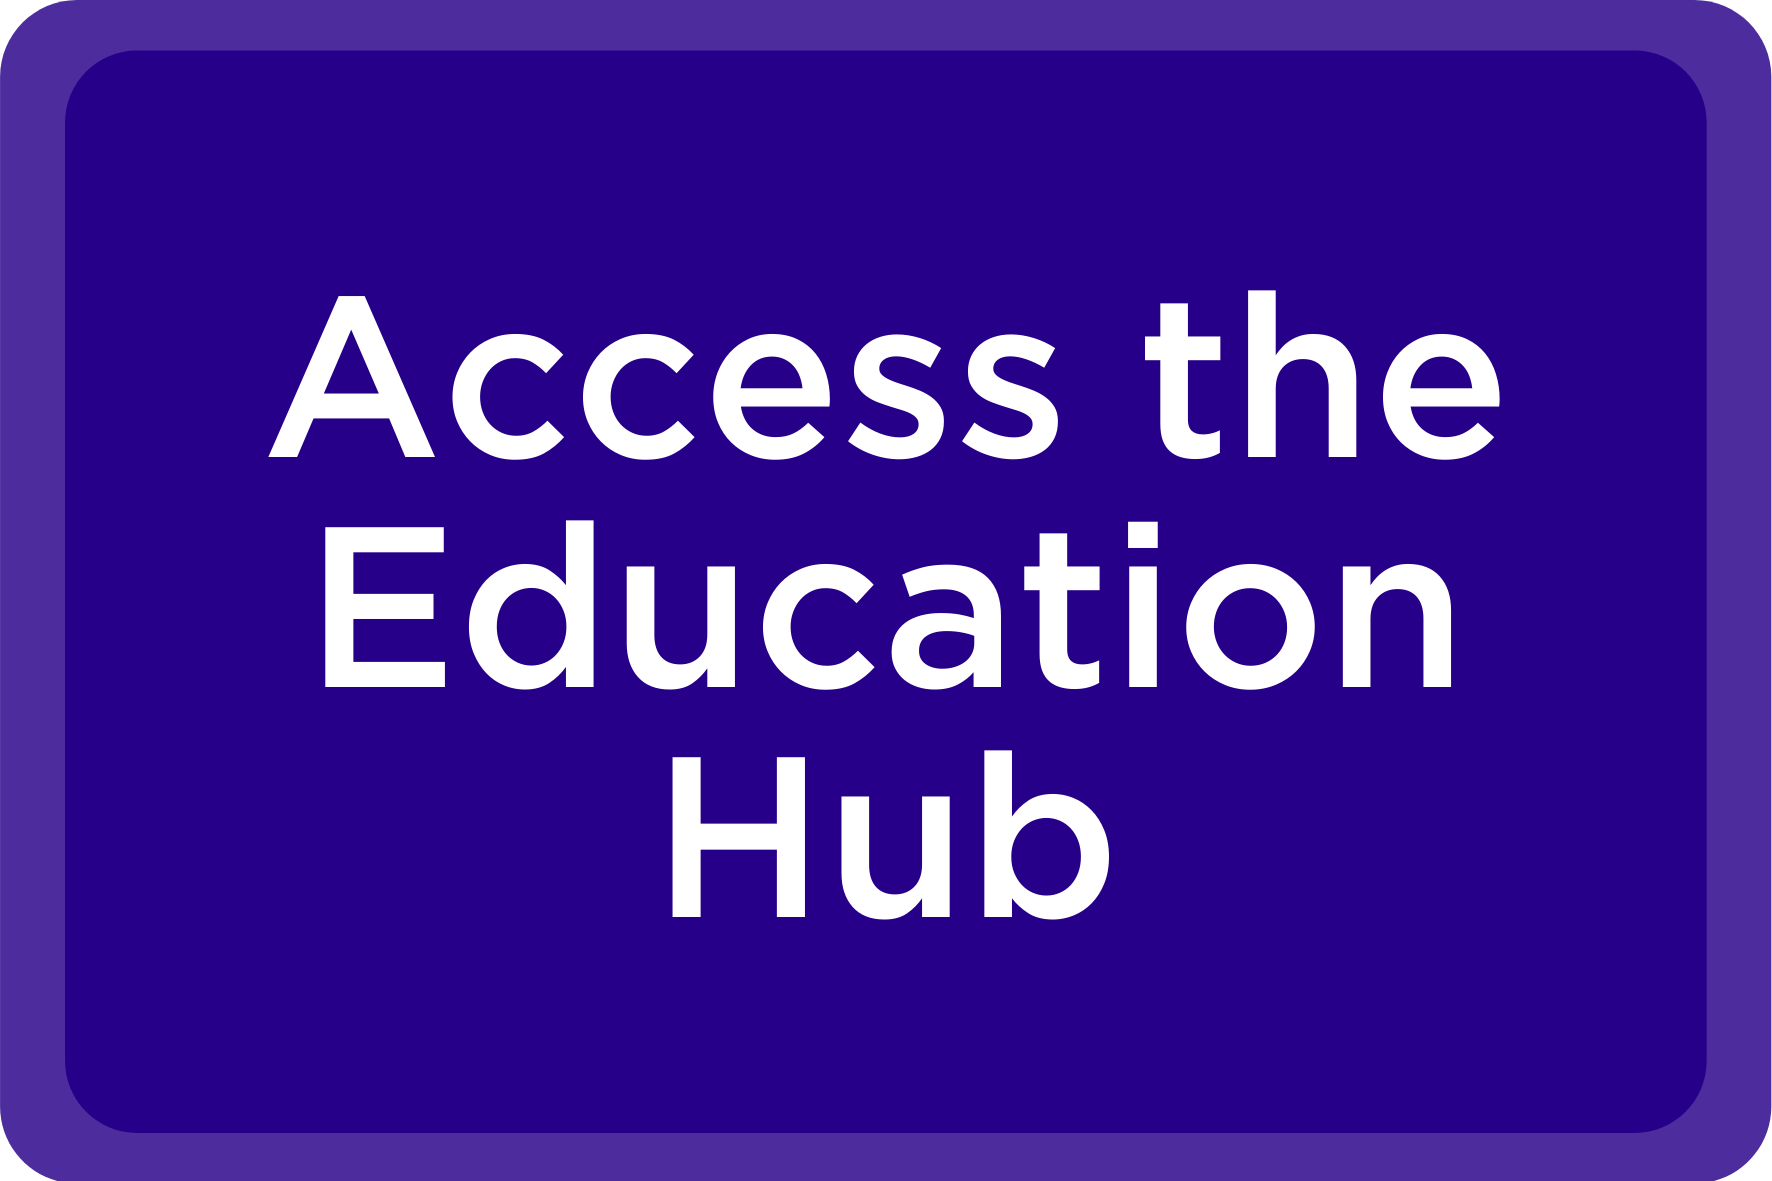 Access the Education Hub